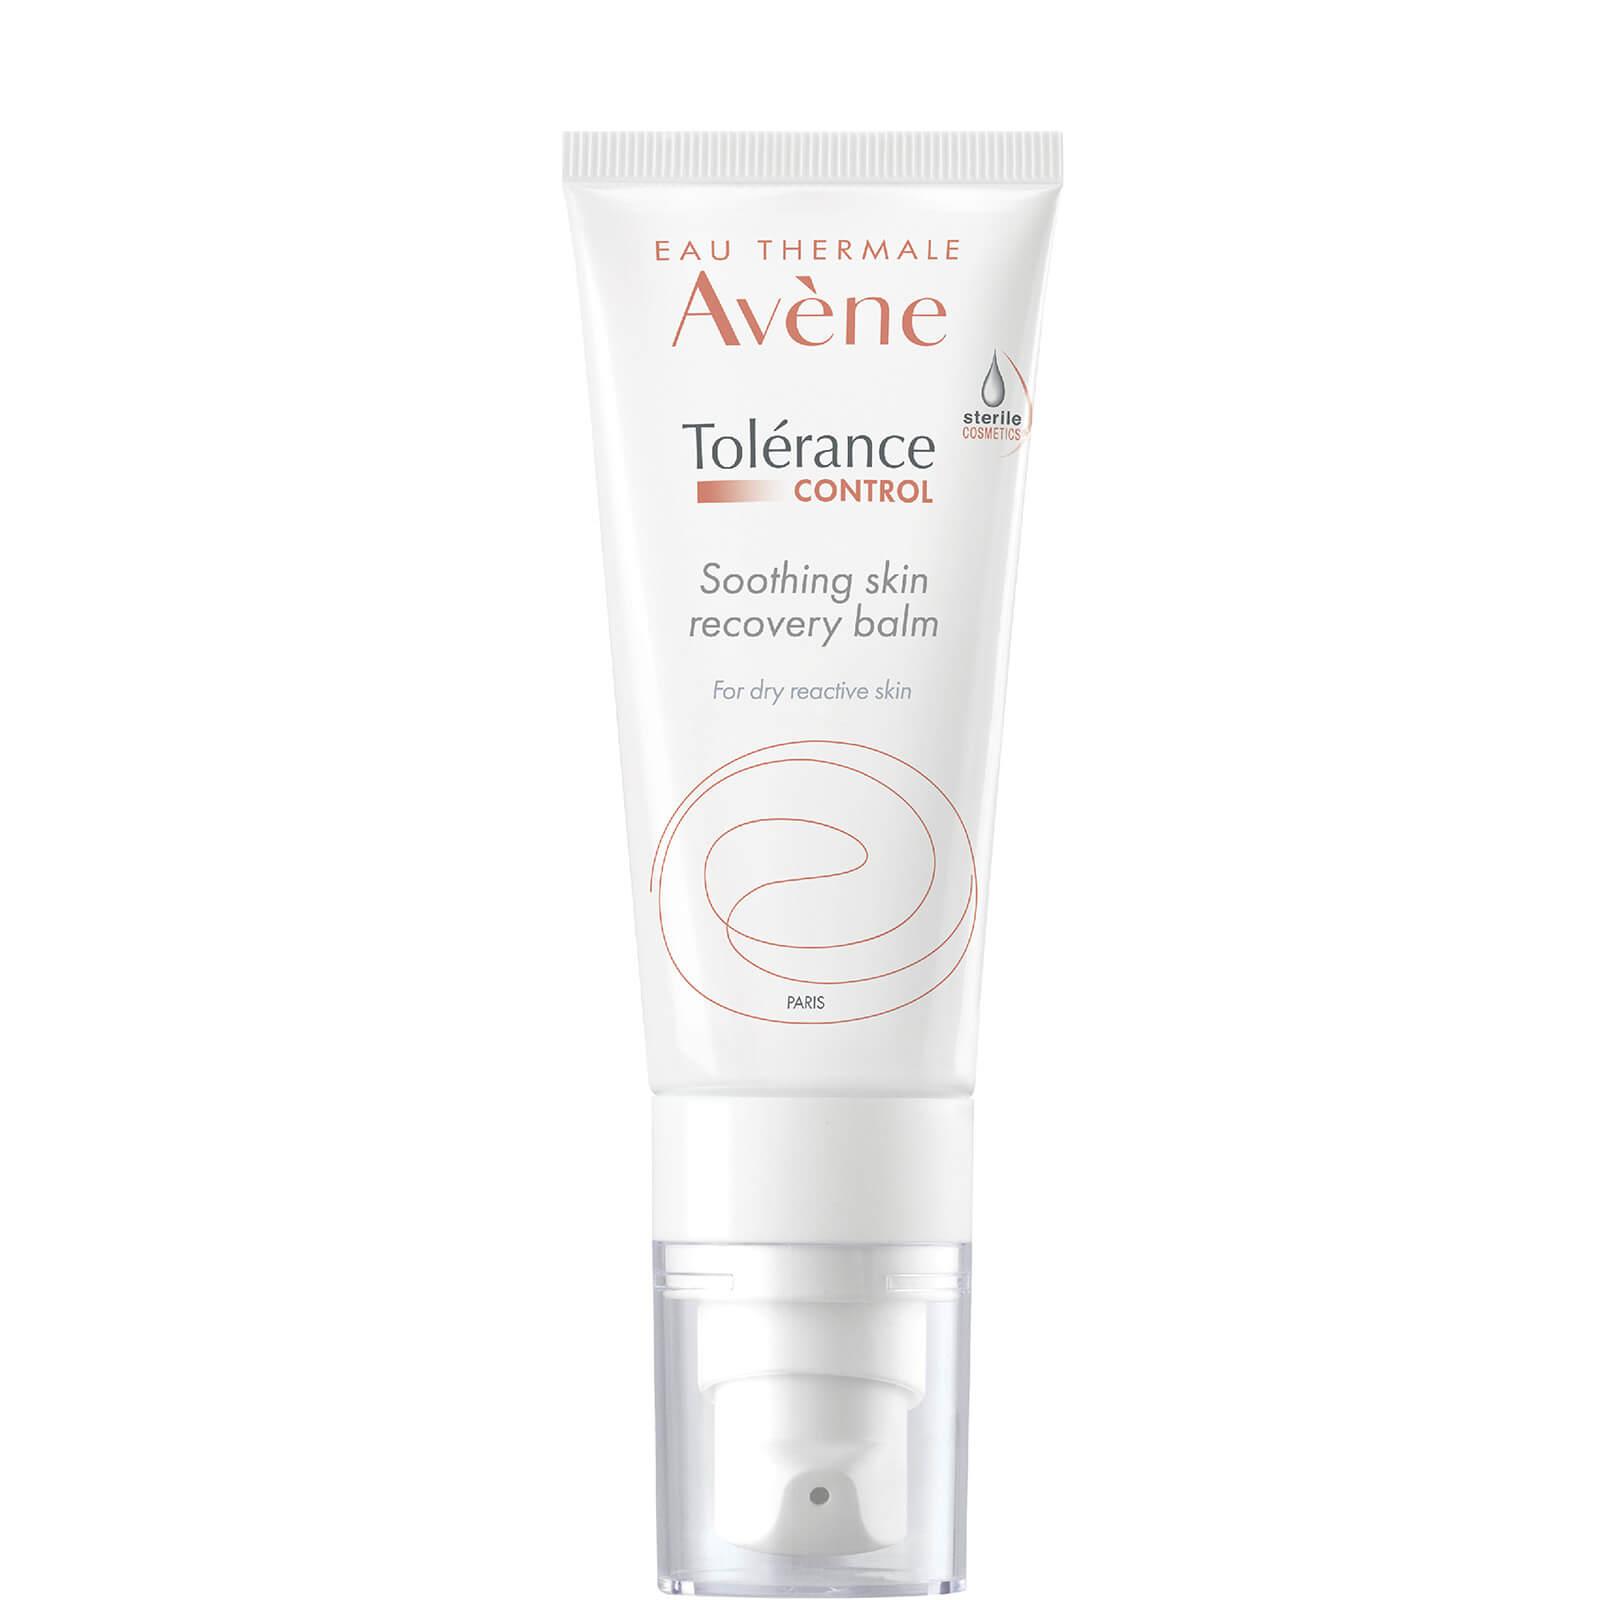 Купить Avène Tolerance Control Soothing Skin Recovery Balm for Dry Sensitive Skin 40ml